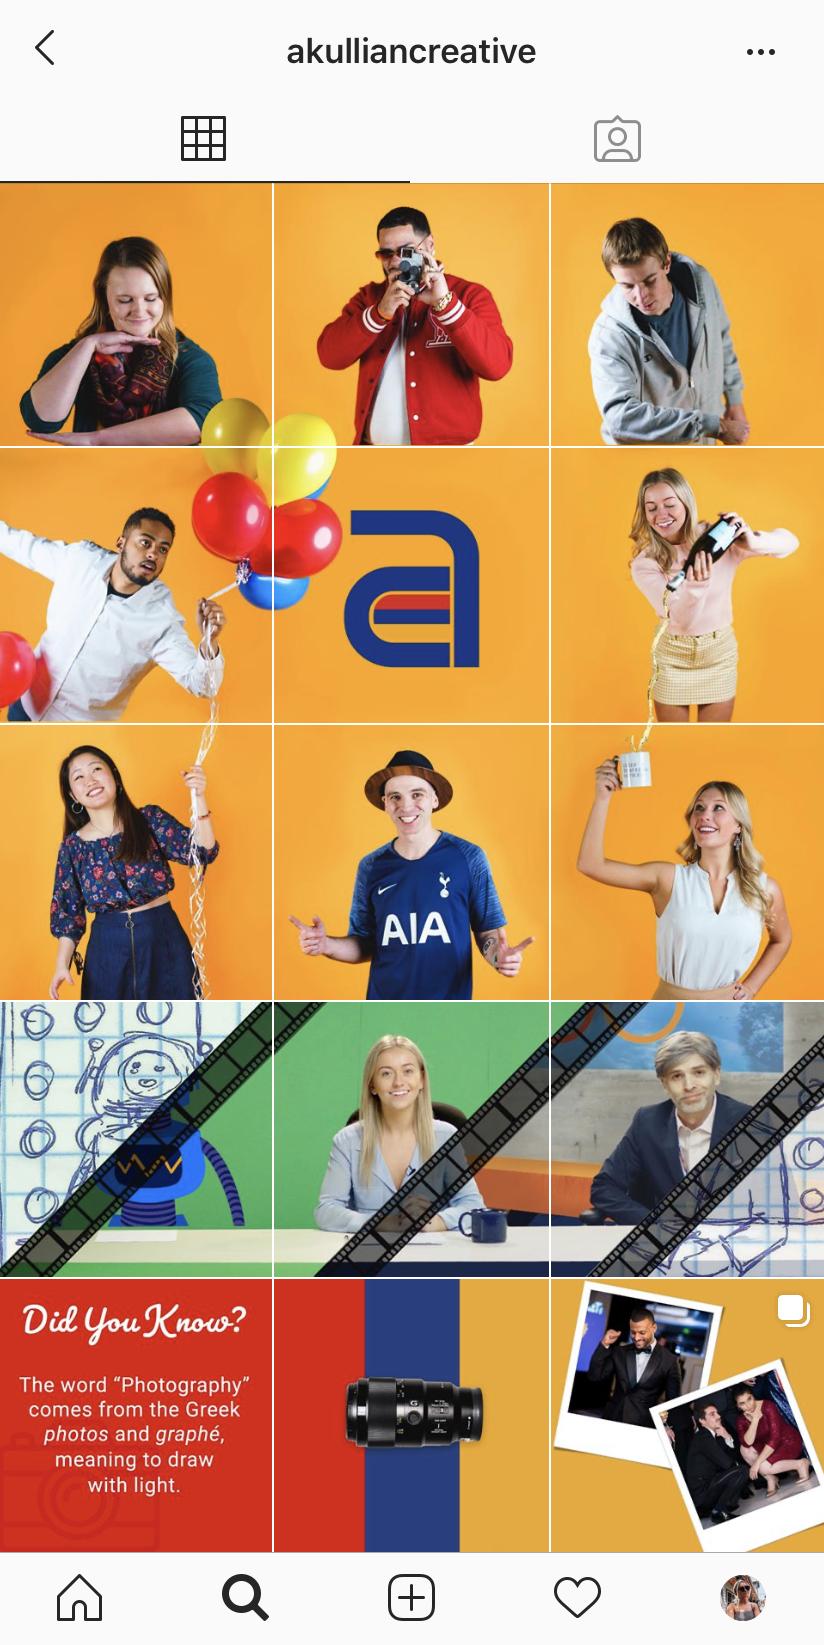 Akullian Creative Instagram screenshot